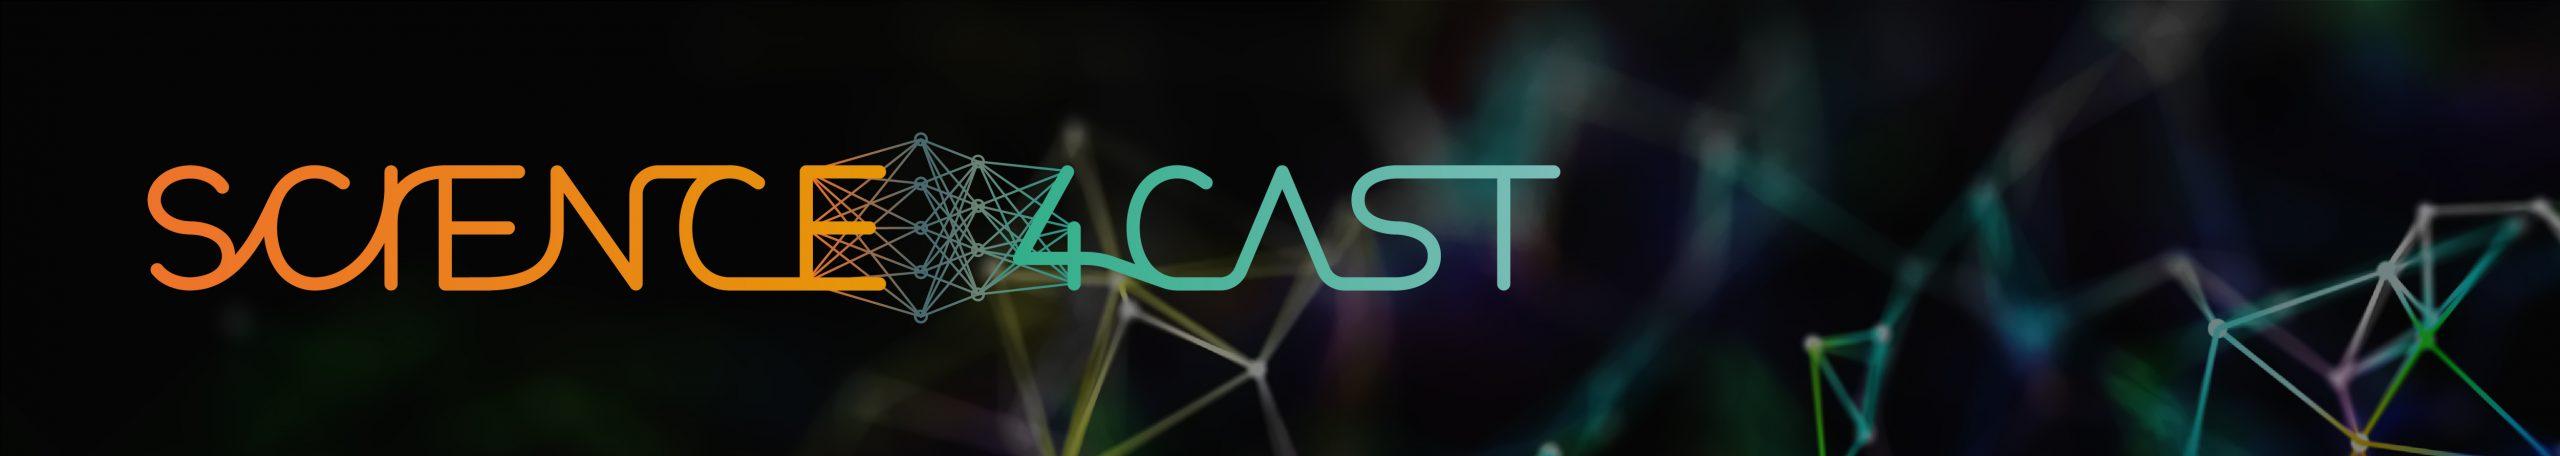 Science4cast